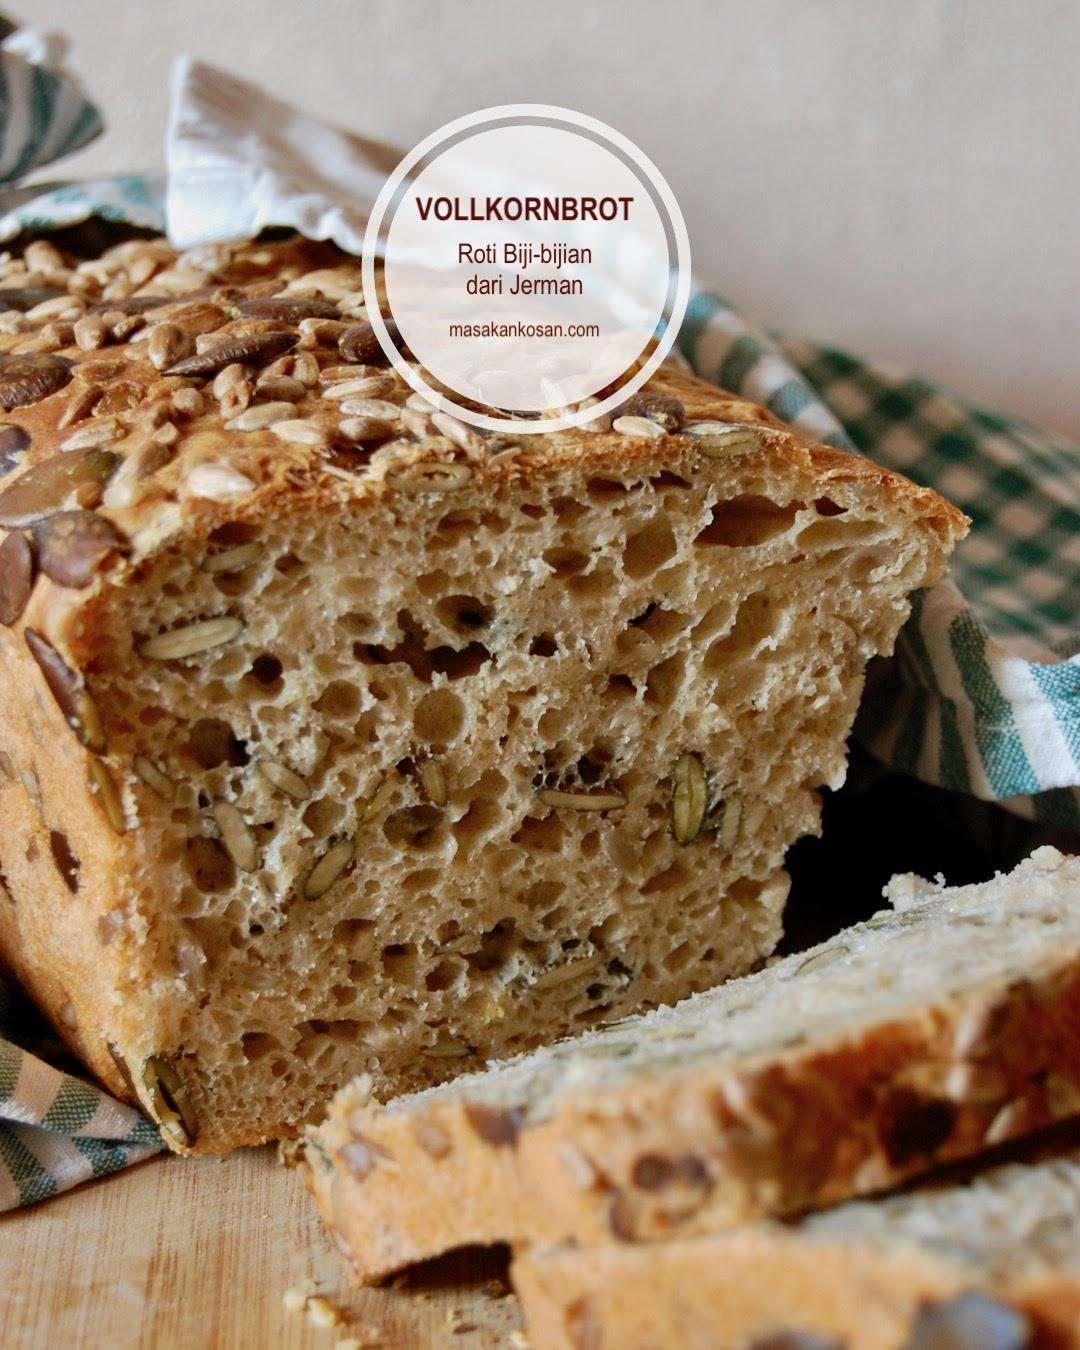 Vollkornbrot, Roti Biji-Bijian penuh gizi